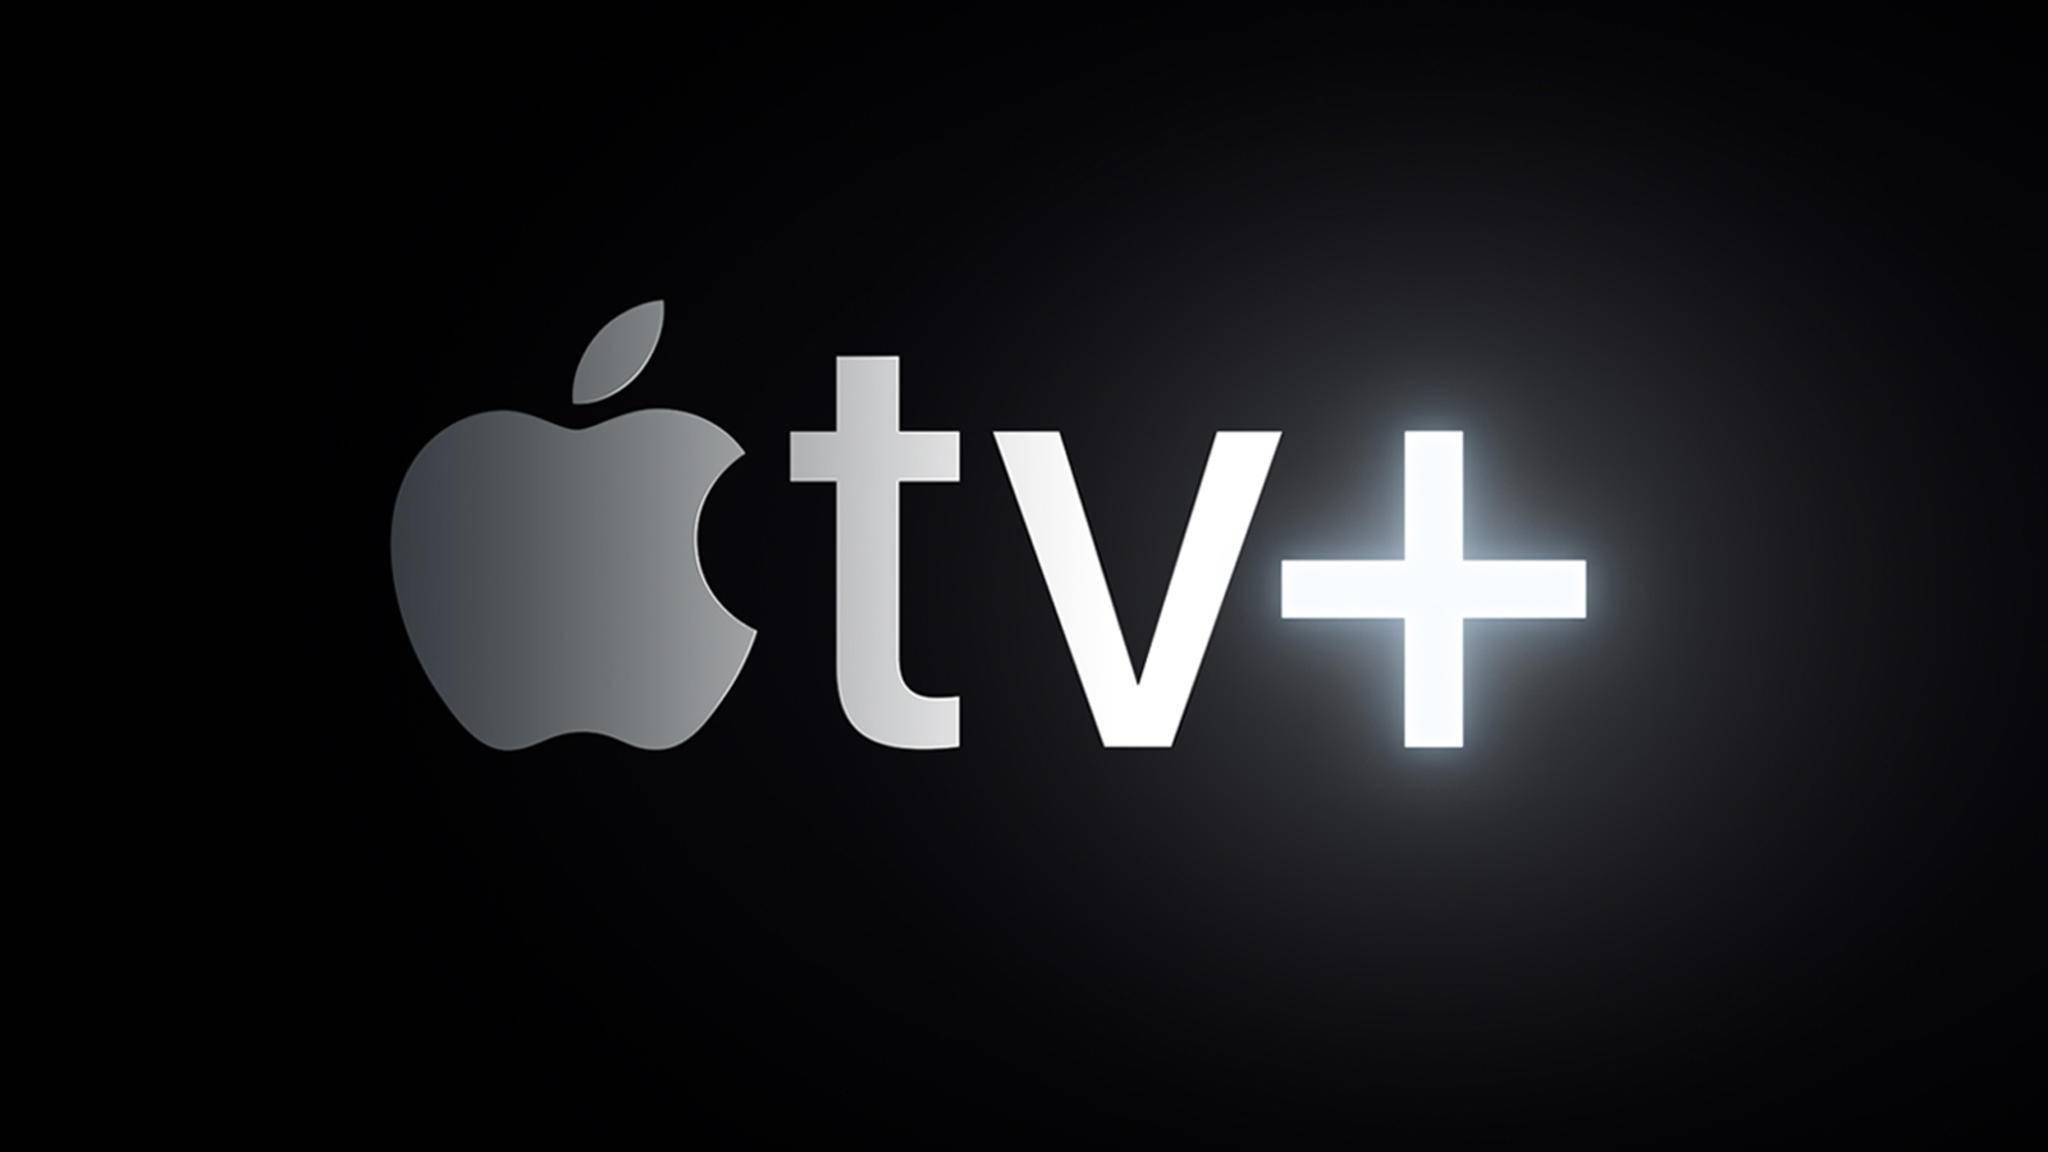 Apple TV+ ist am 1. November 2019 gestartet.